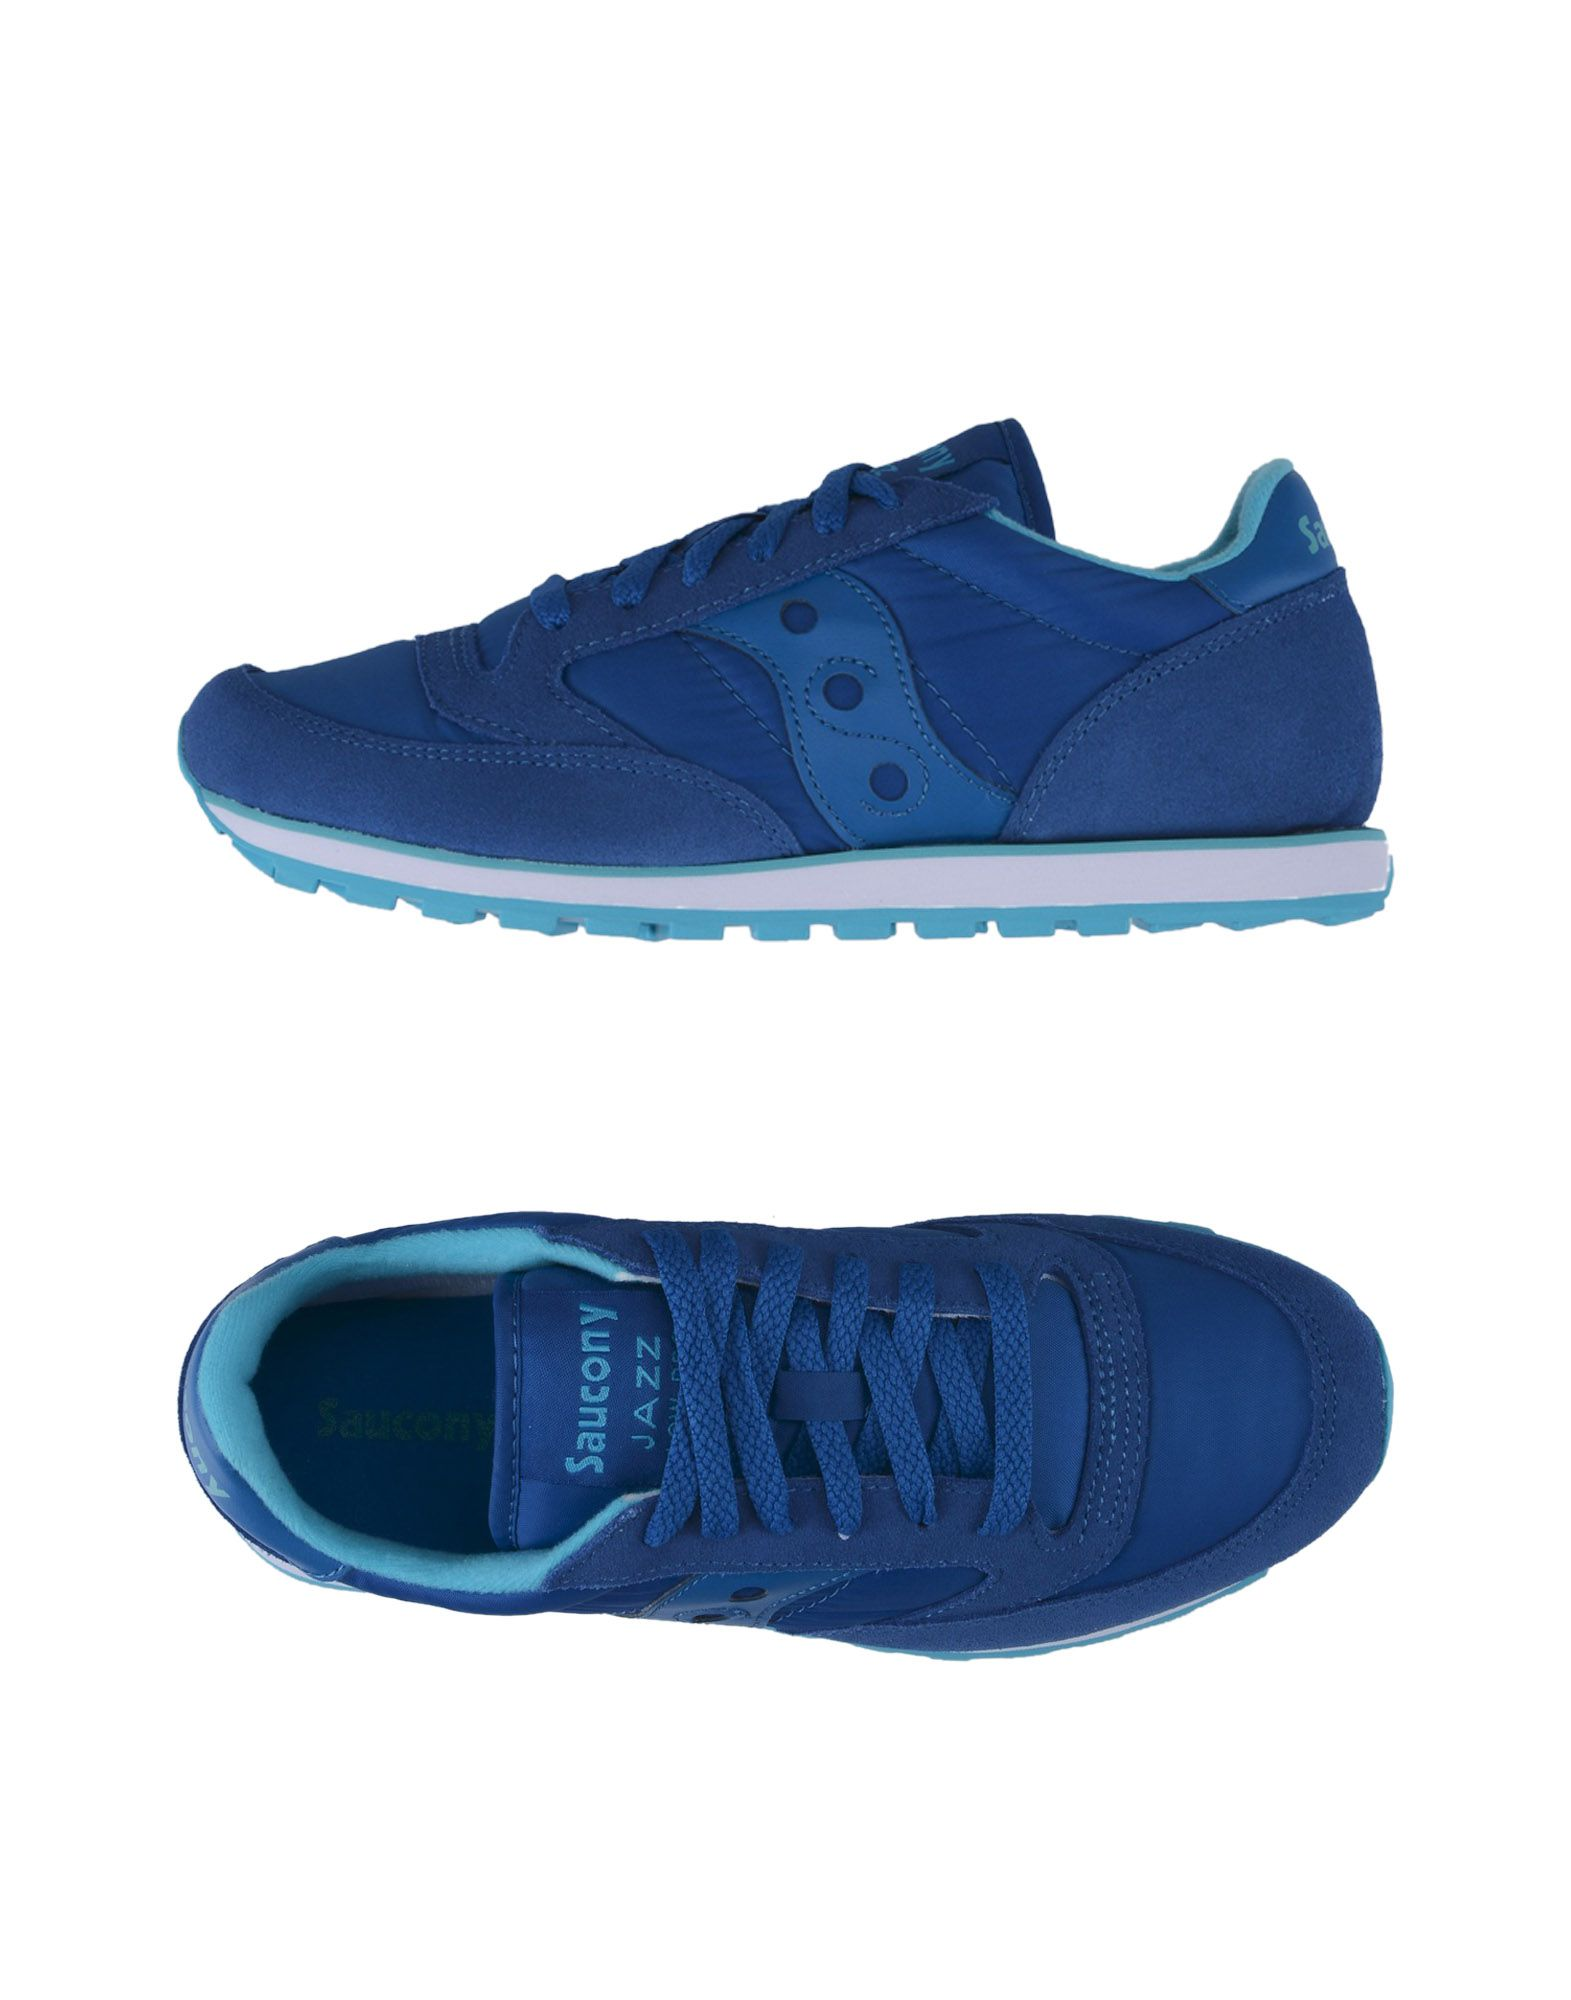 Sneakers Saucony Jazz Low Pro W - Donna - Acquista online su